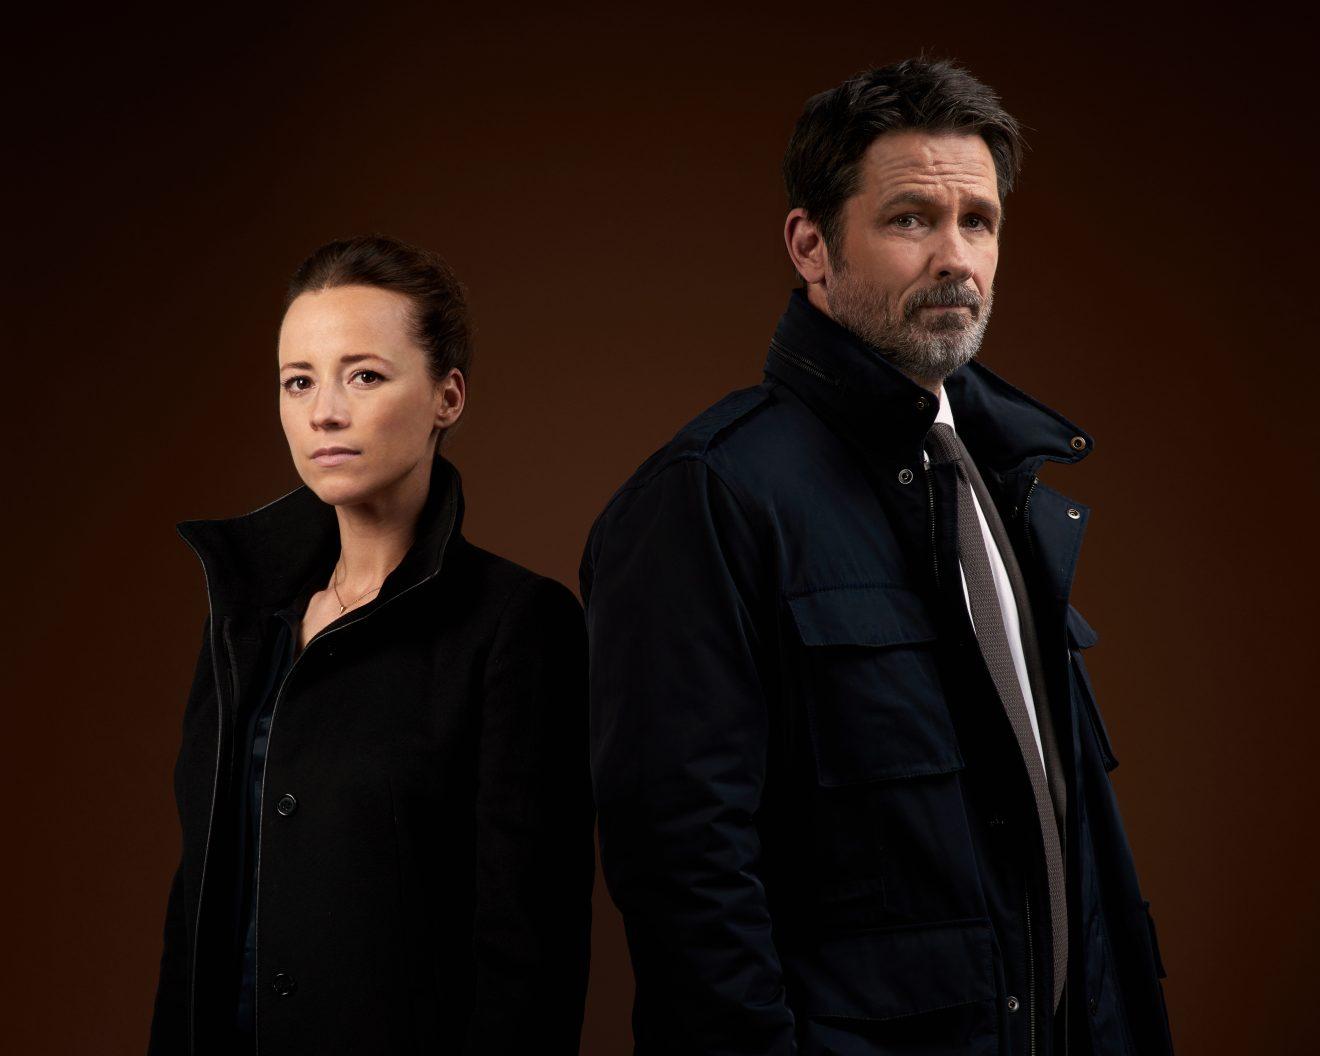 Karine Vanasse and Billy Campbell | Cardinal Season 3